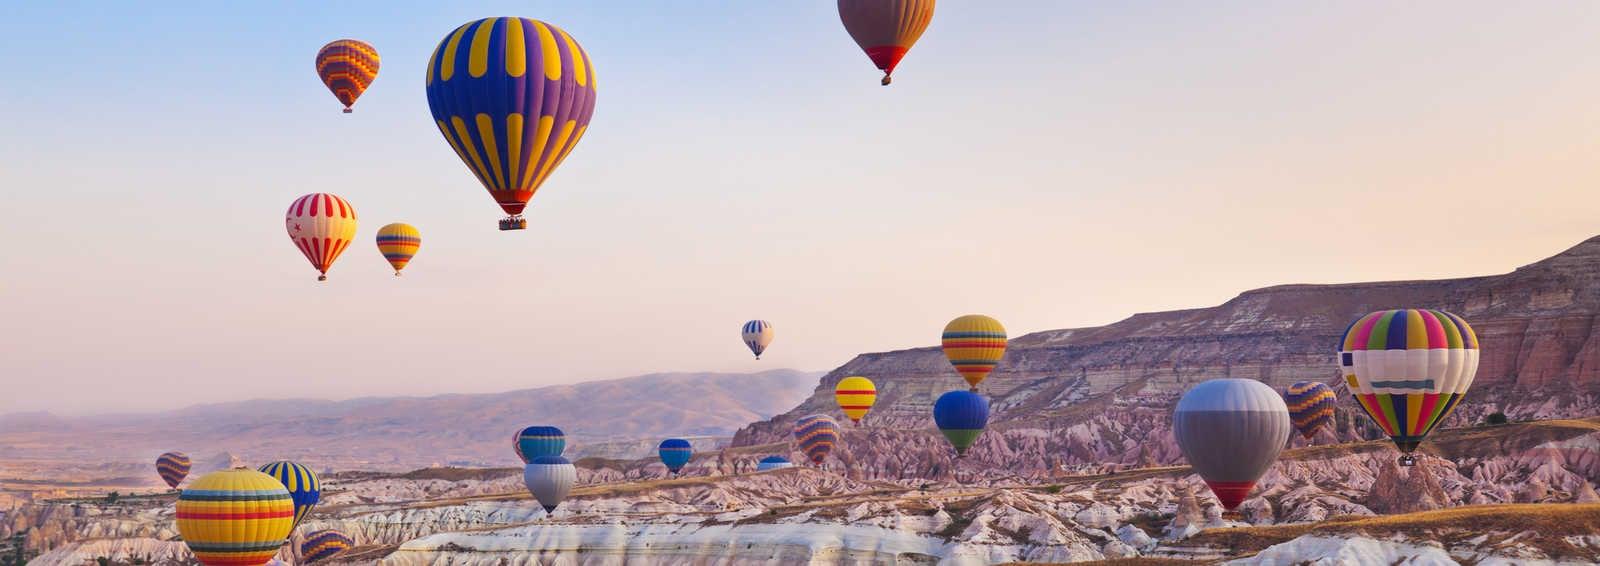 Hot air balloon flying over rock landscape at Cappadocia, Turkey